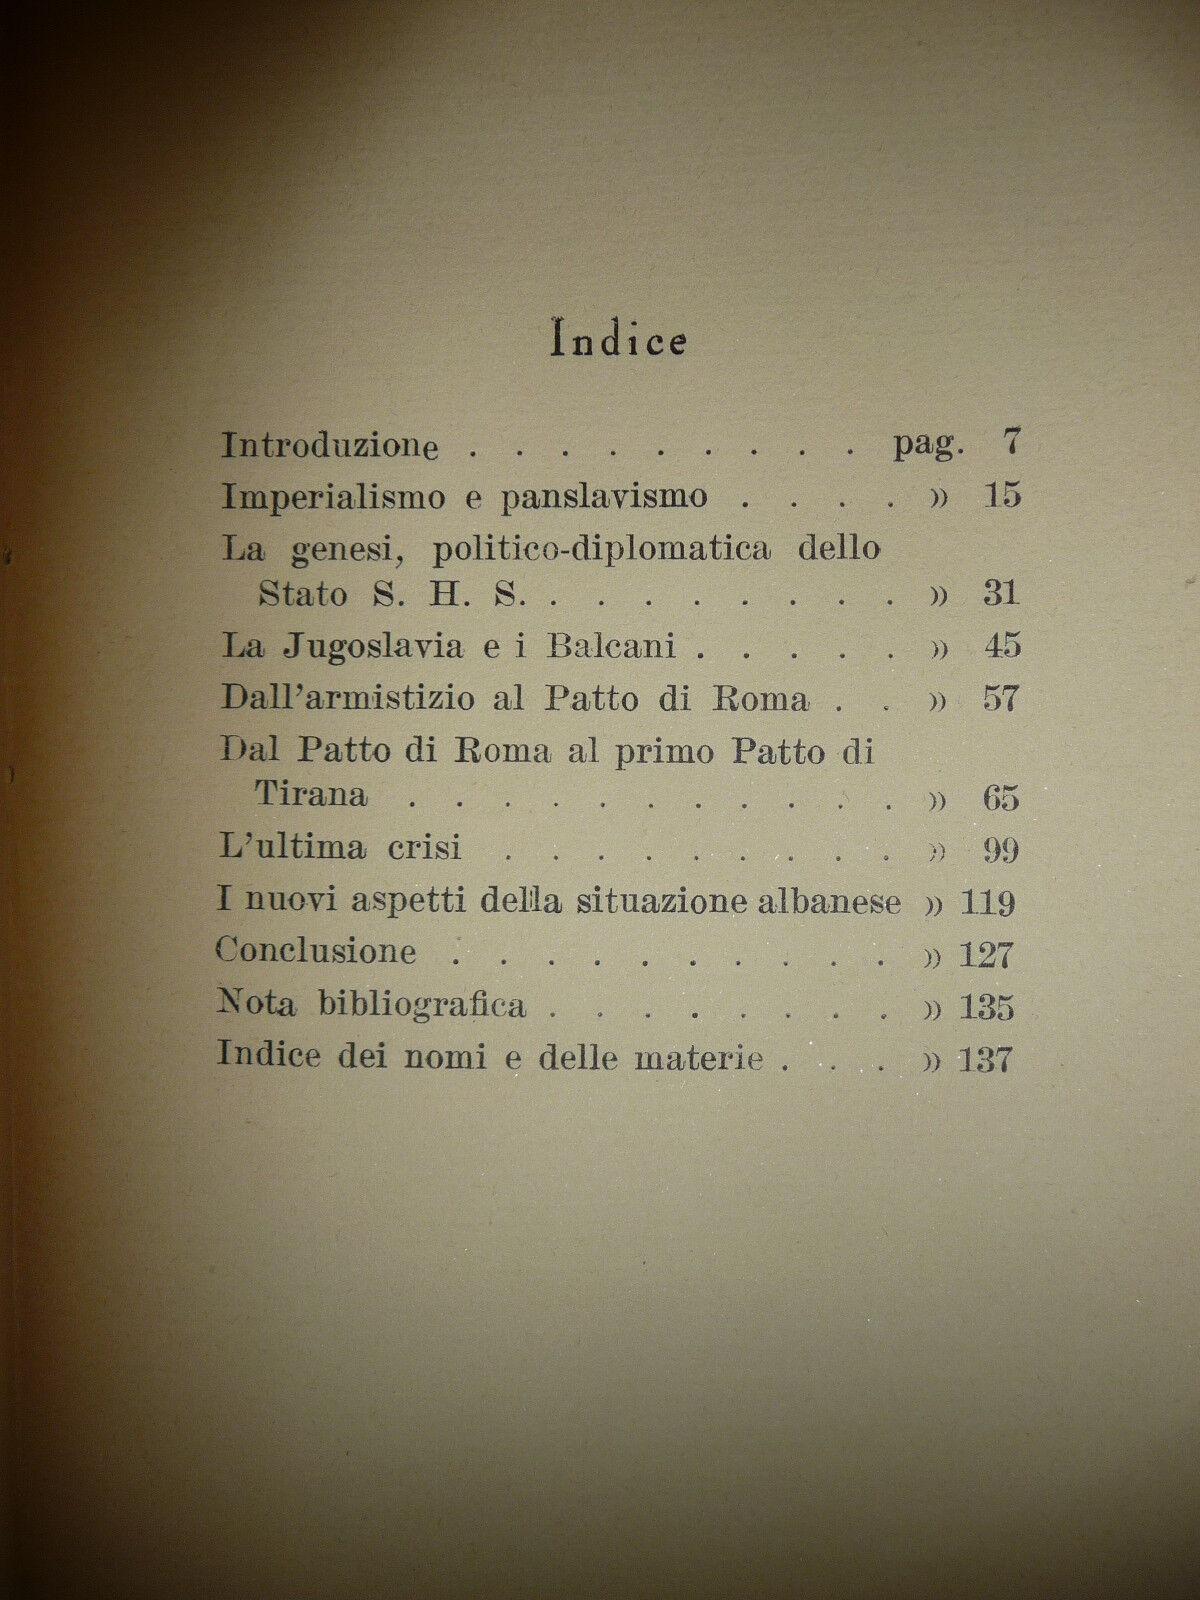 ITALIA E JUGOSLAVIA UMBERTO NANI 1928 IMPERIALISMO E PANSLAVISMO LA JUGOSLAVIA